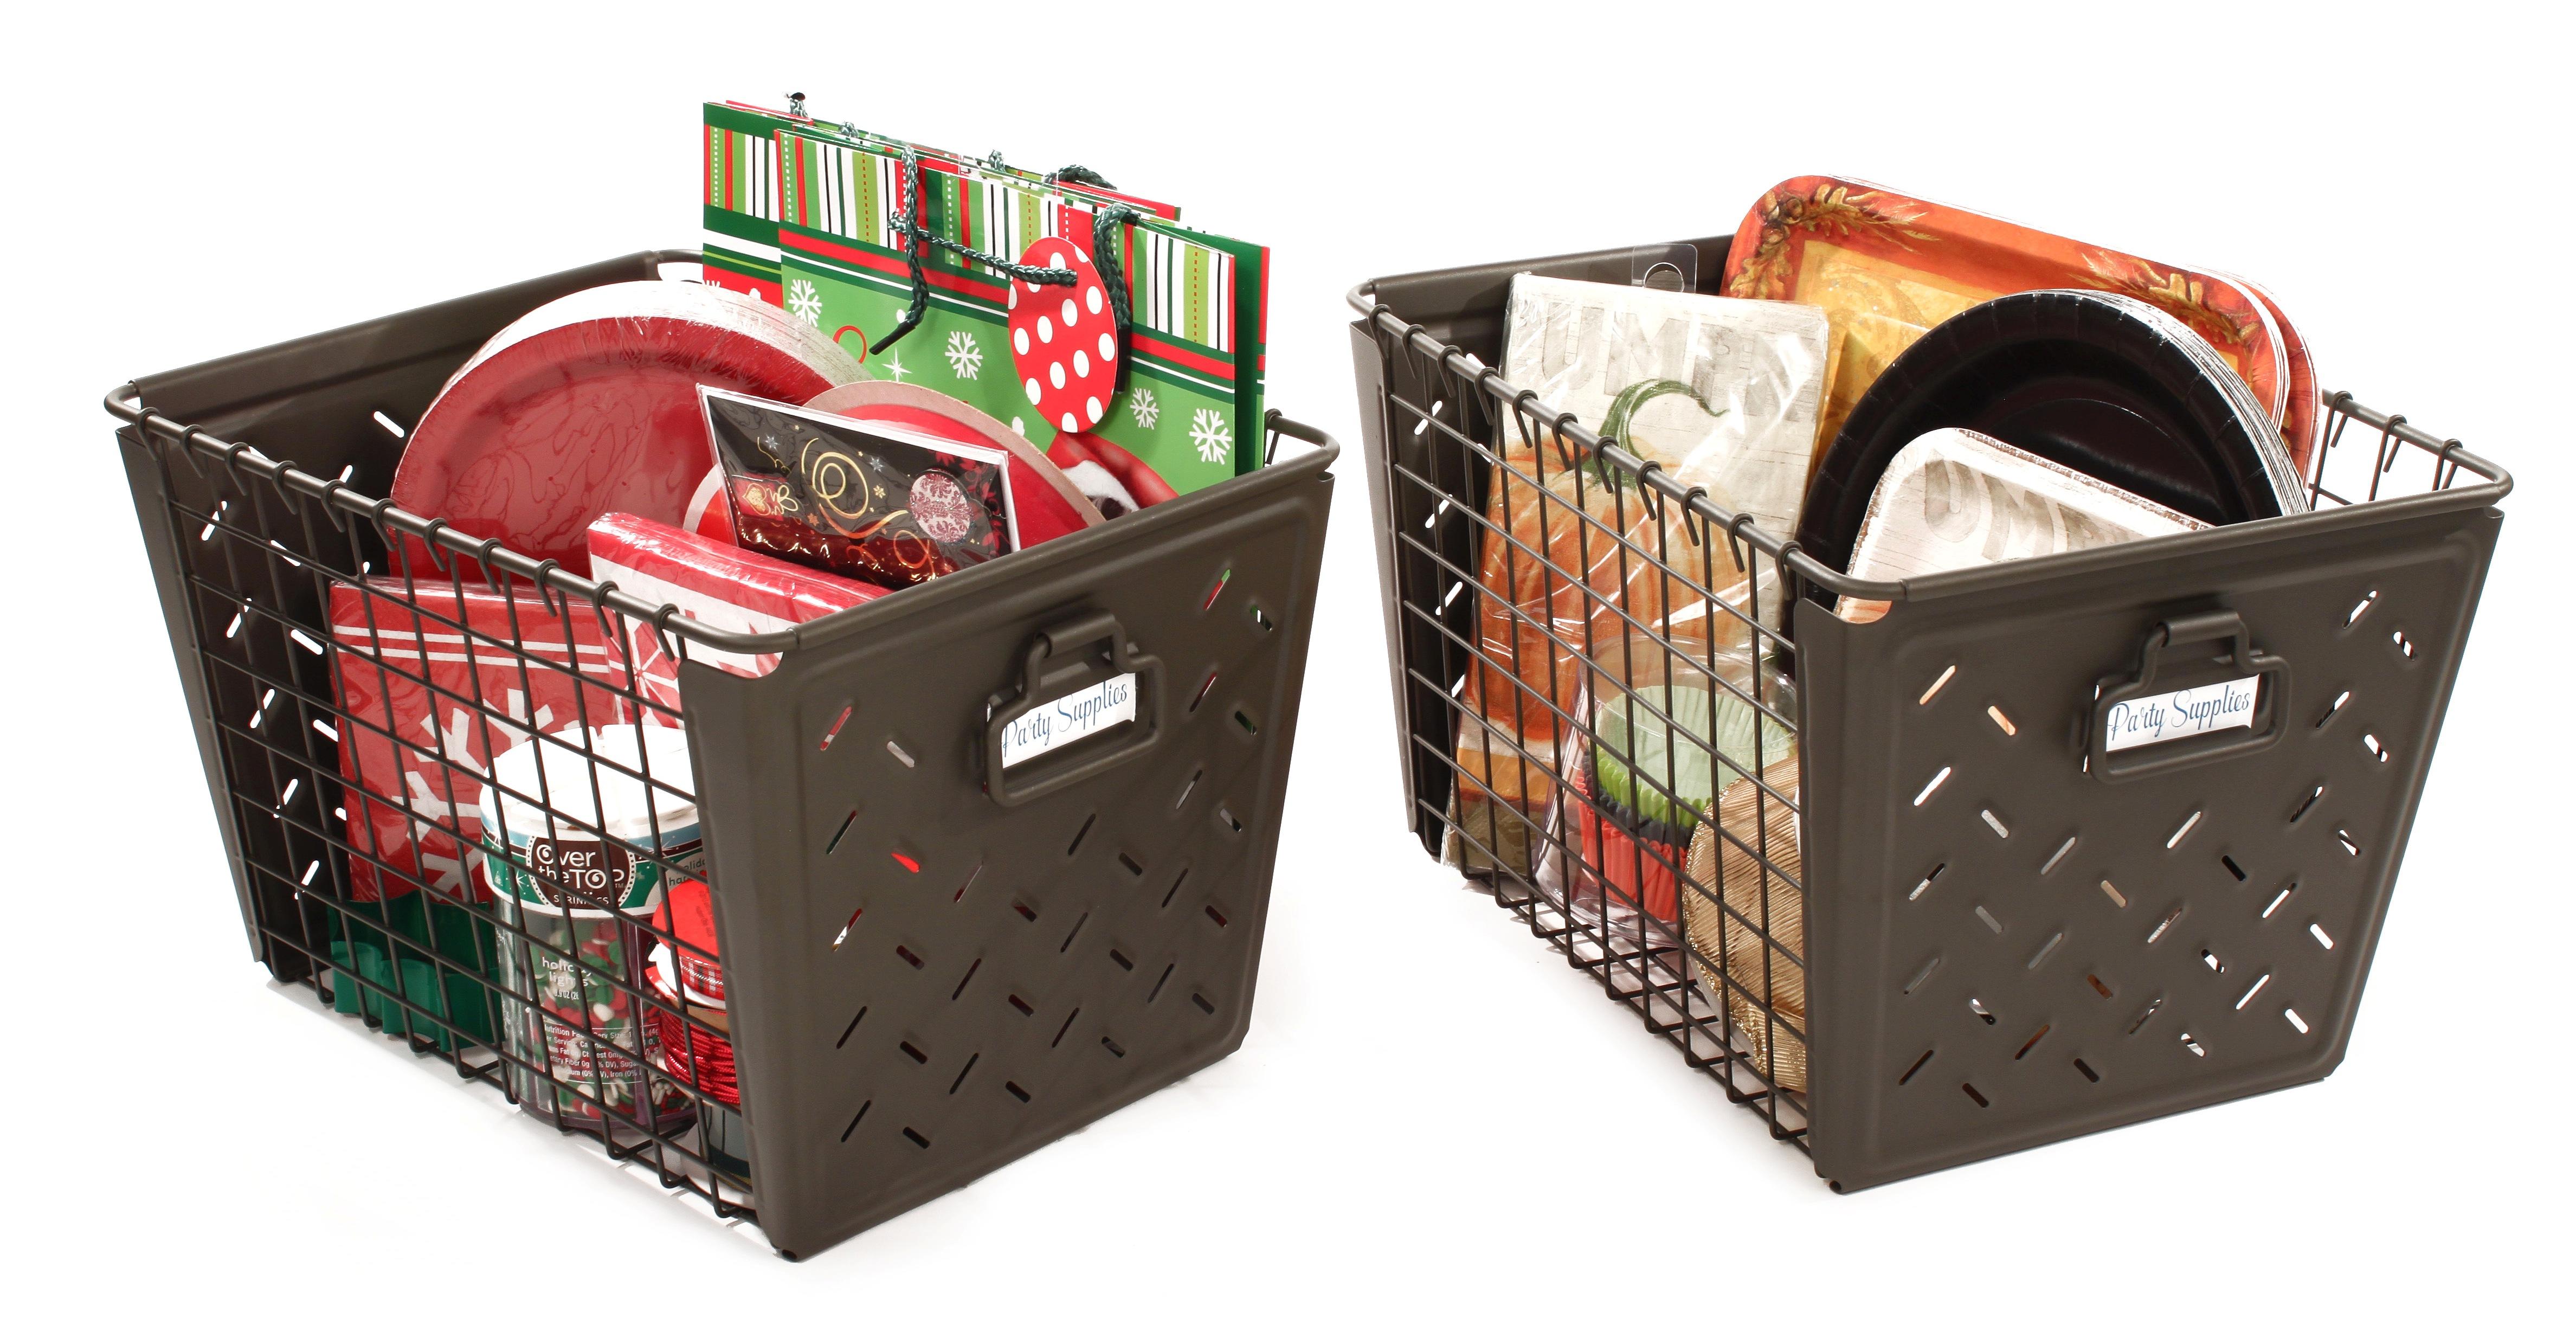 http://www.spectrumdiversified.com/products/macklin-medium-basket